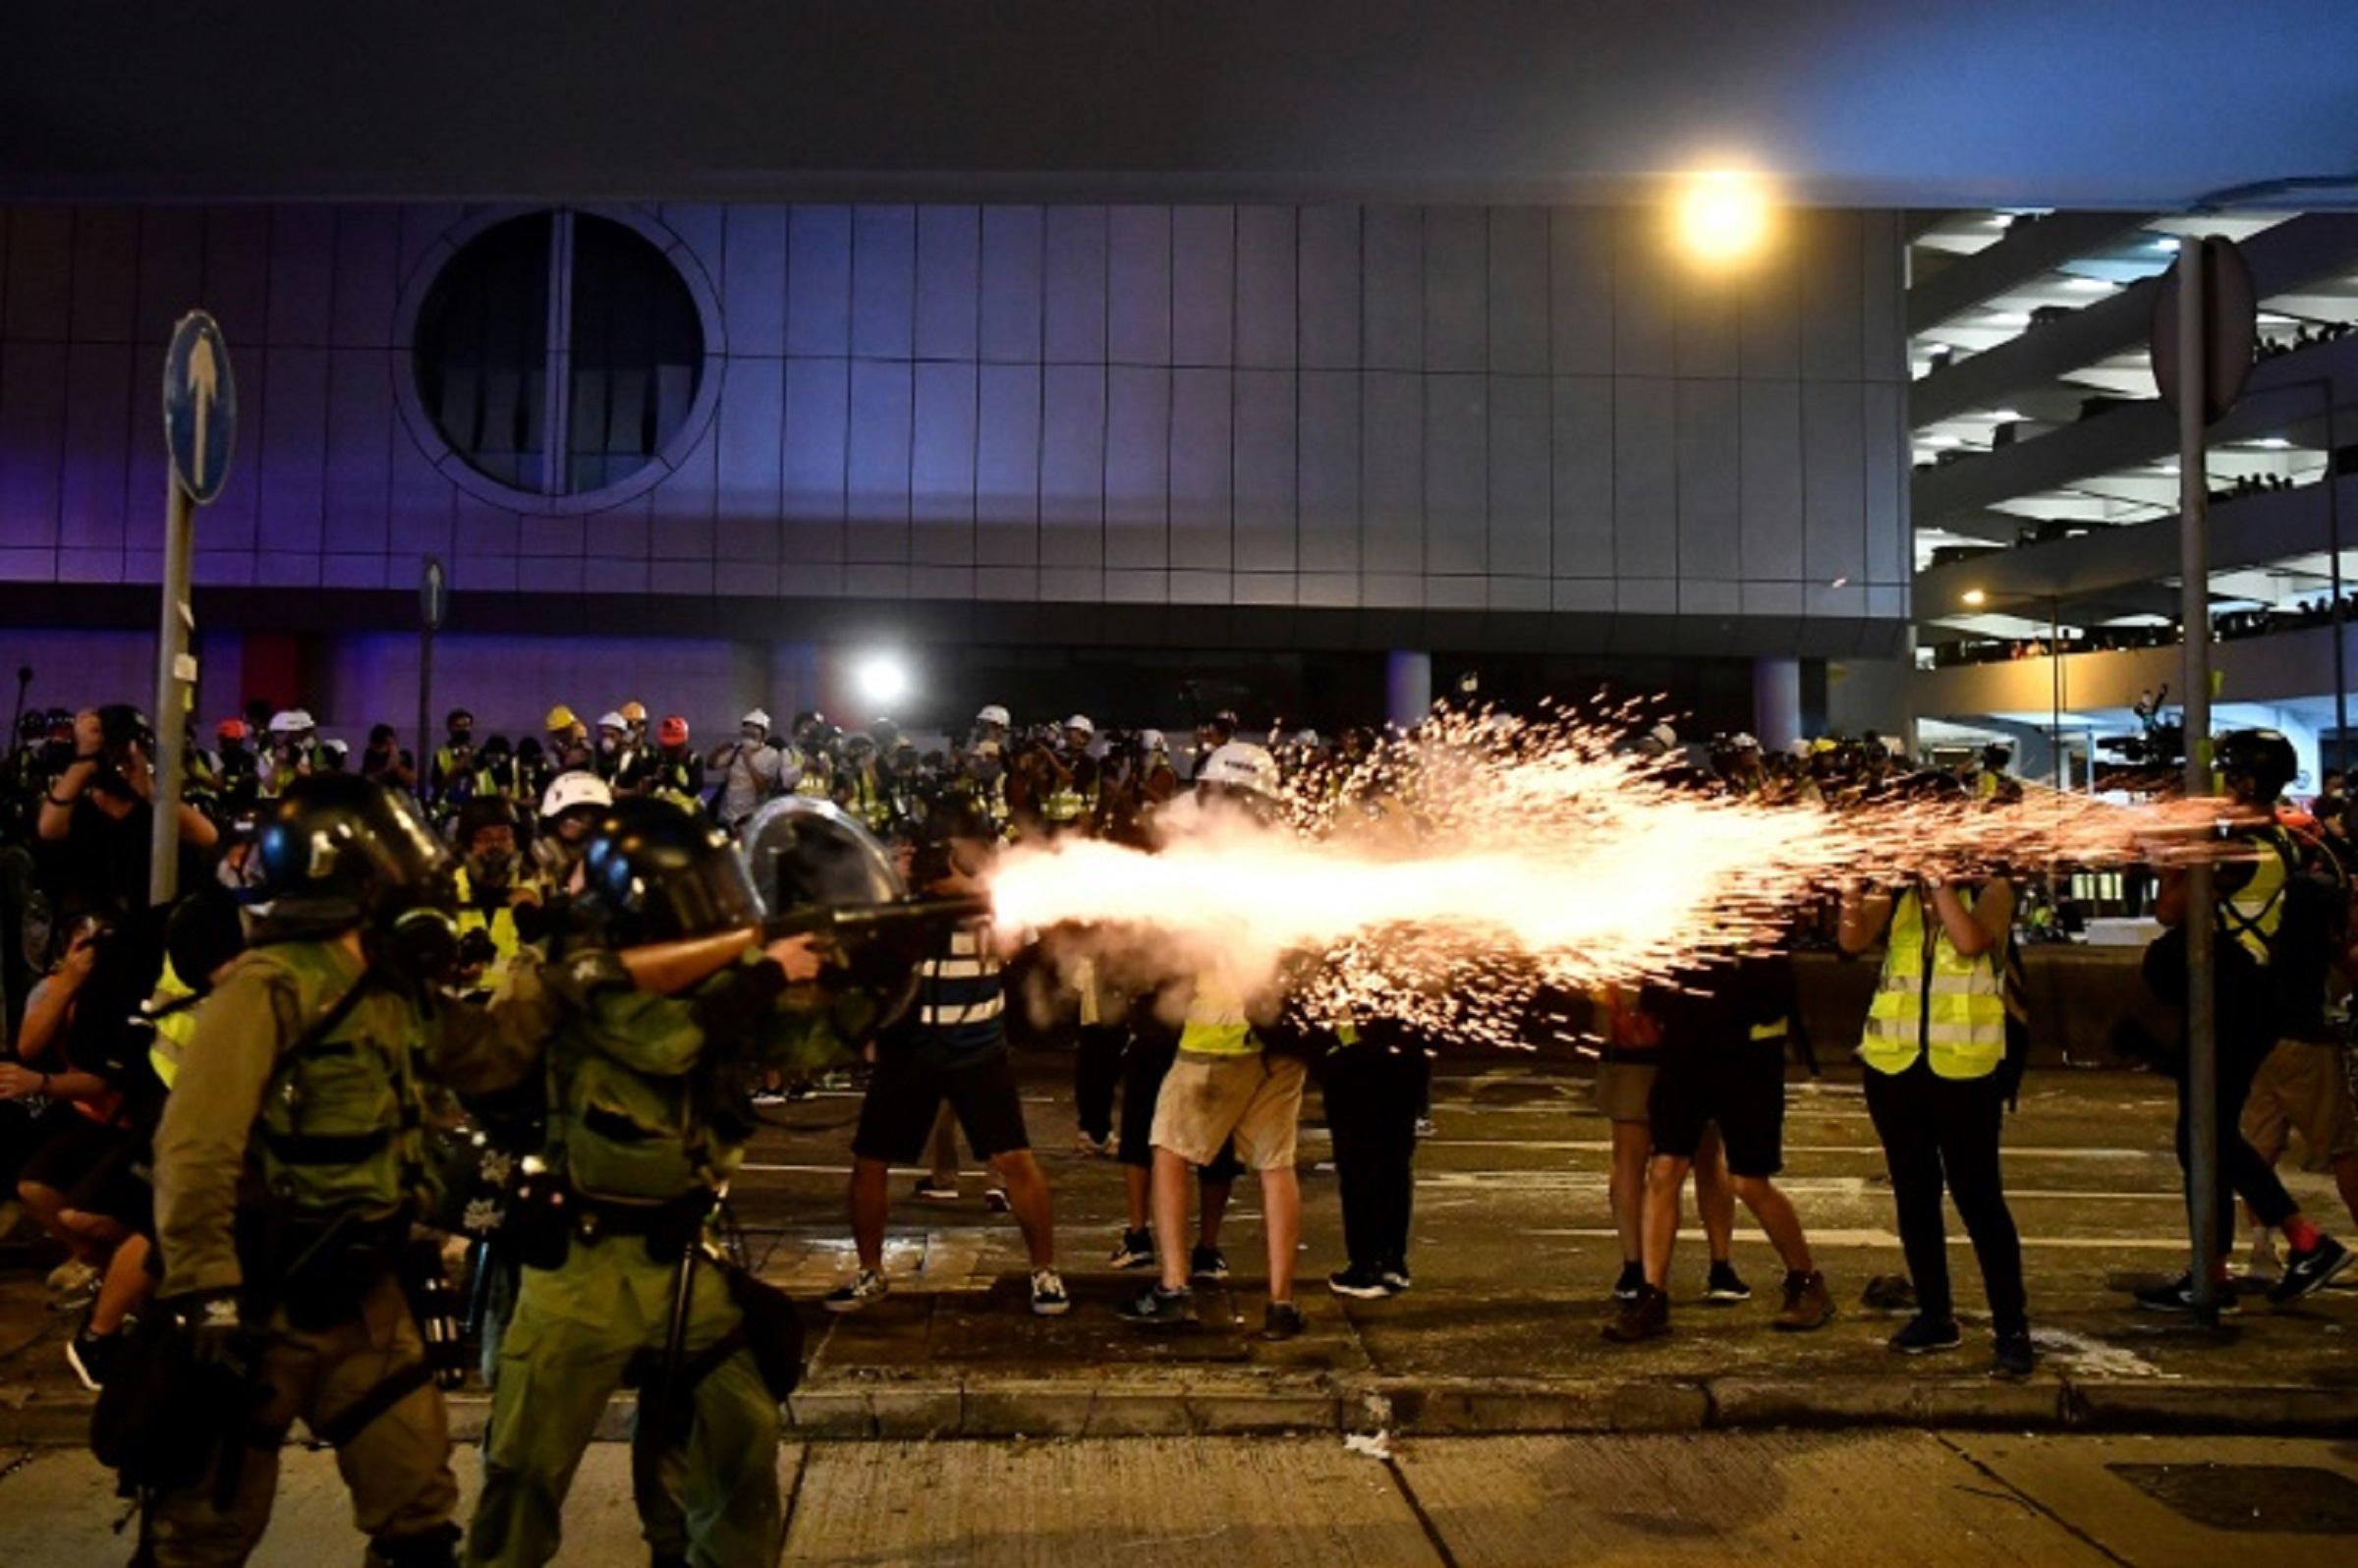 Se agravan agresiones contra manifestantes en Hong Kong